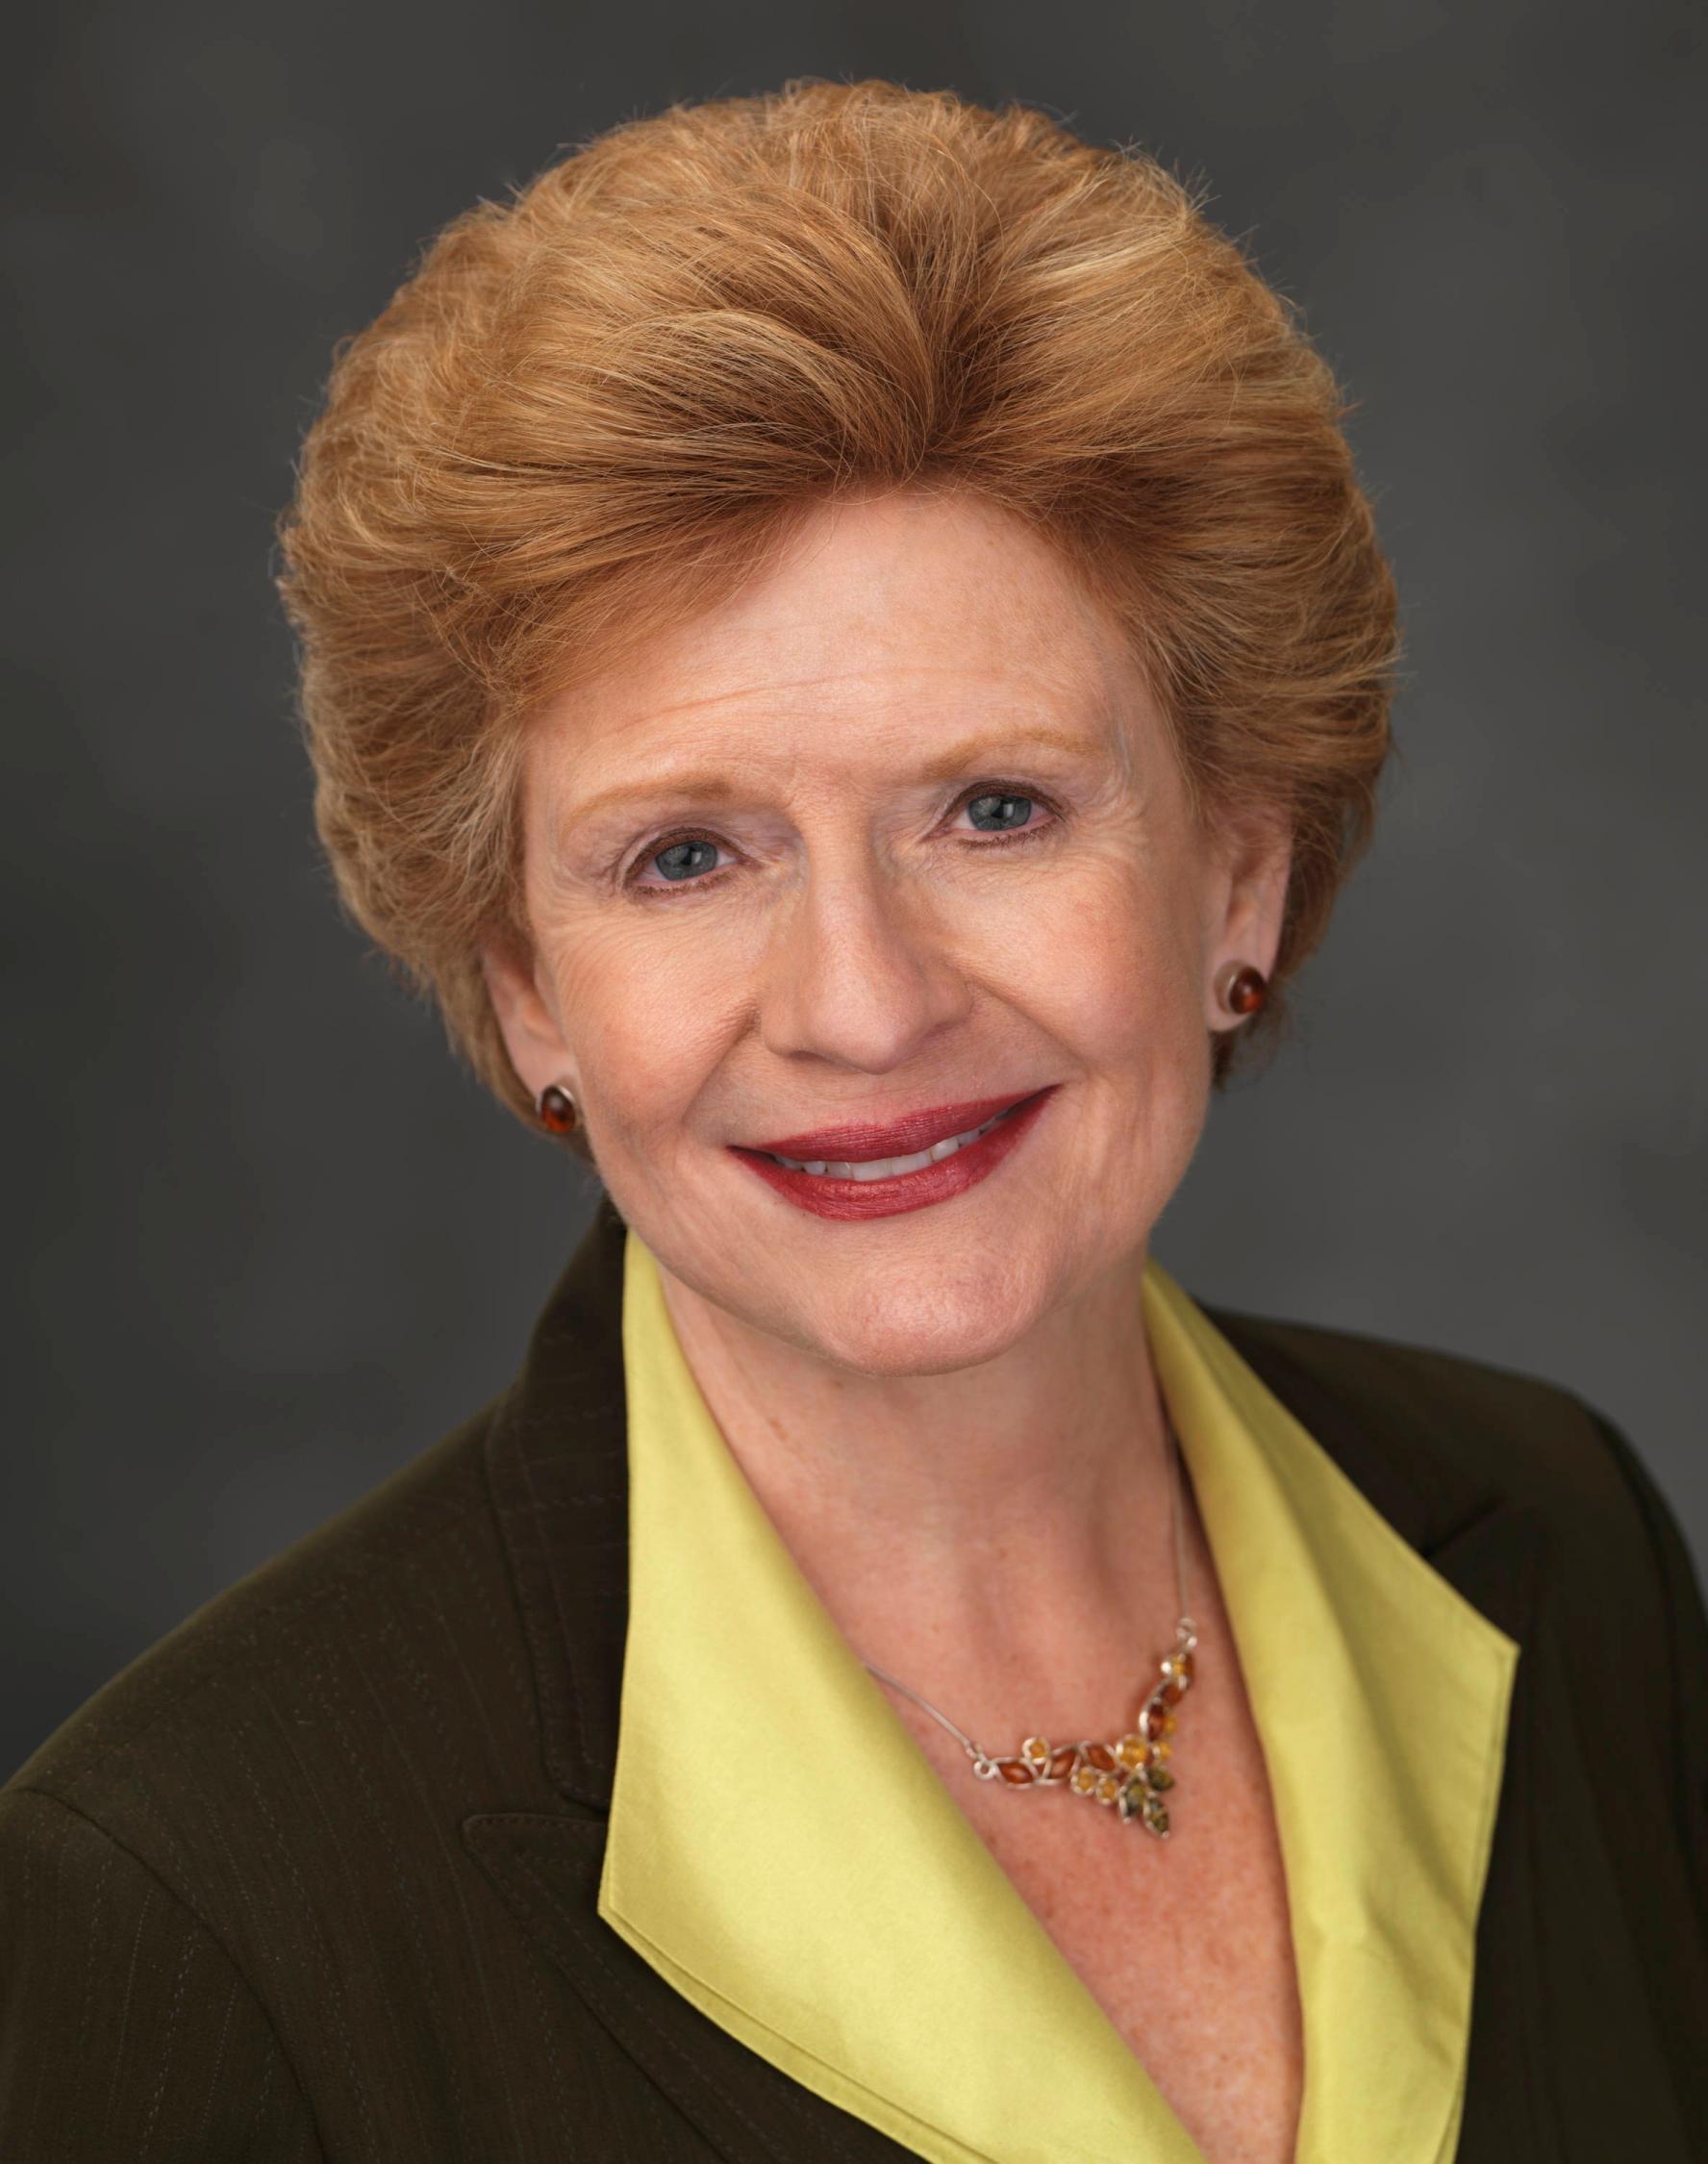 A Conversation With Michigan Senator Debbie Stabenow About